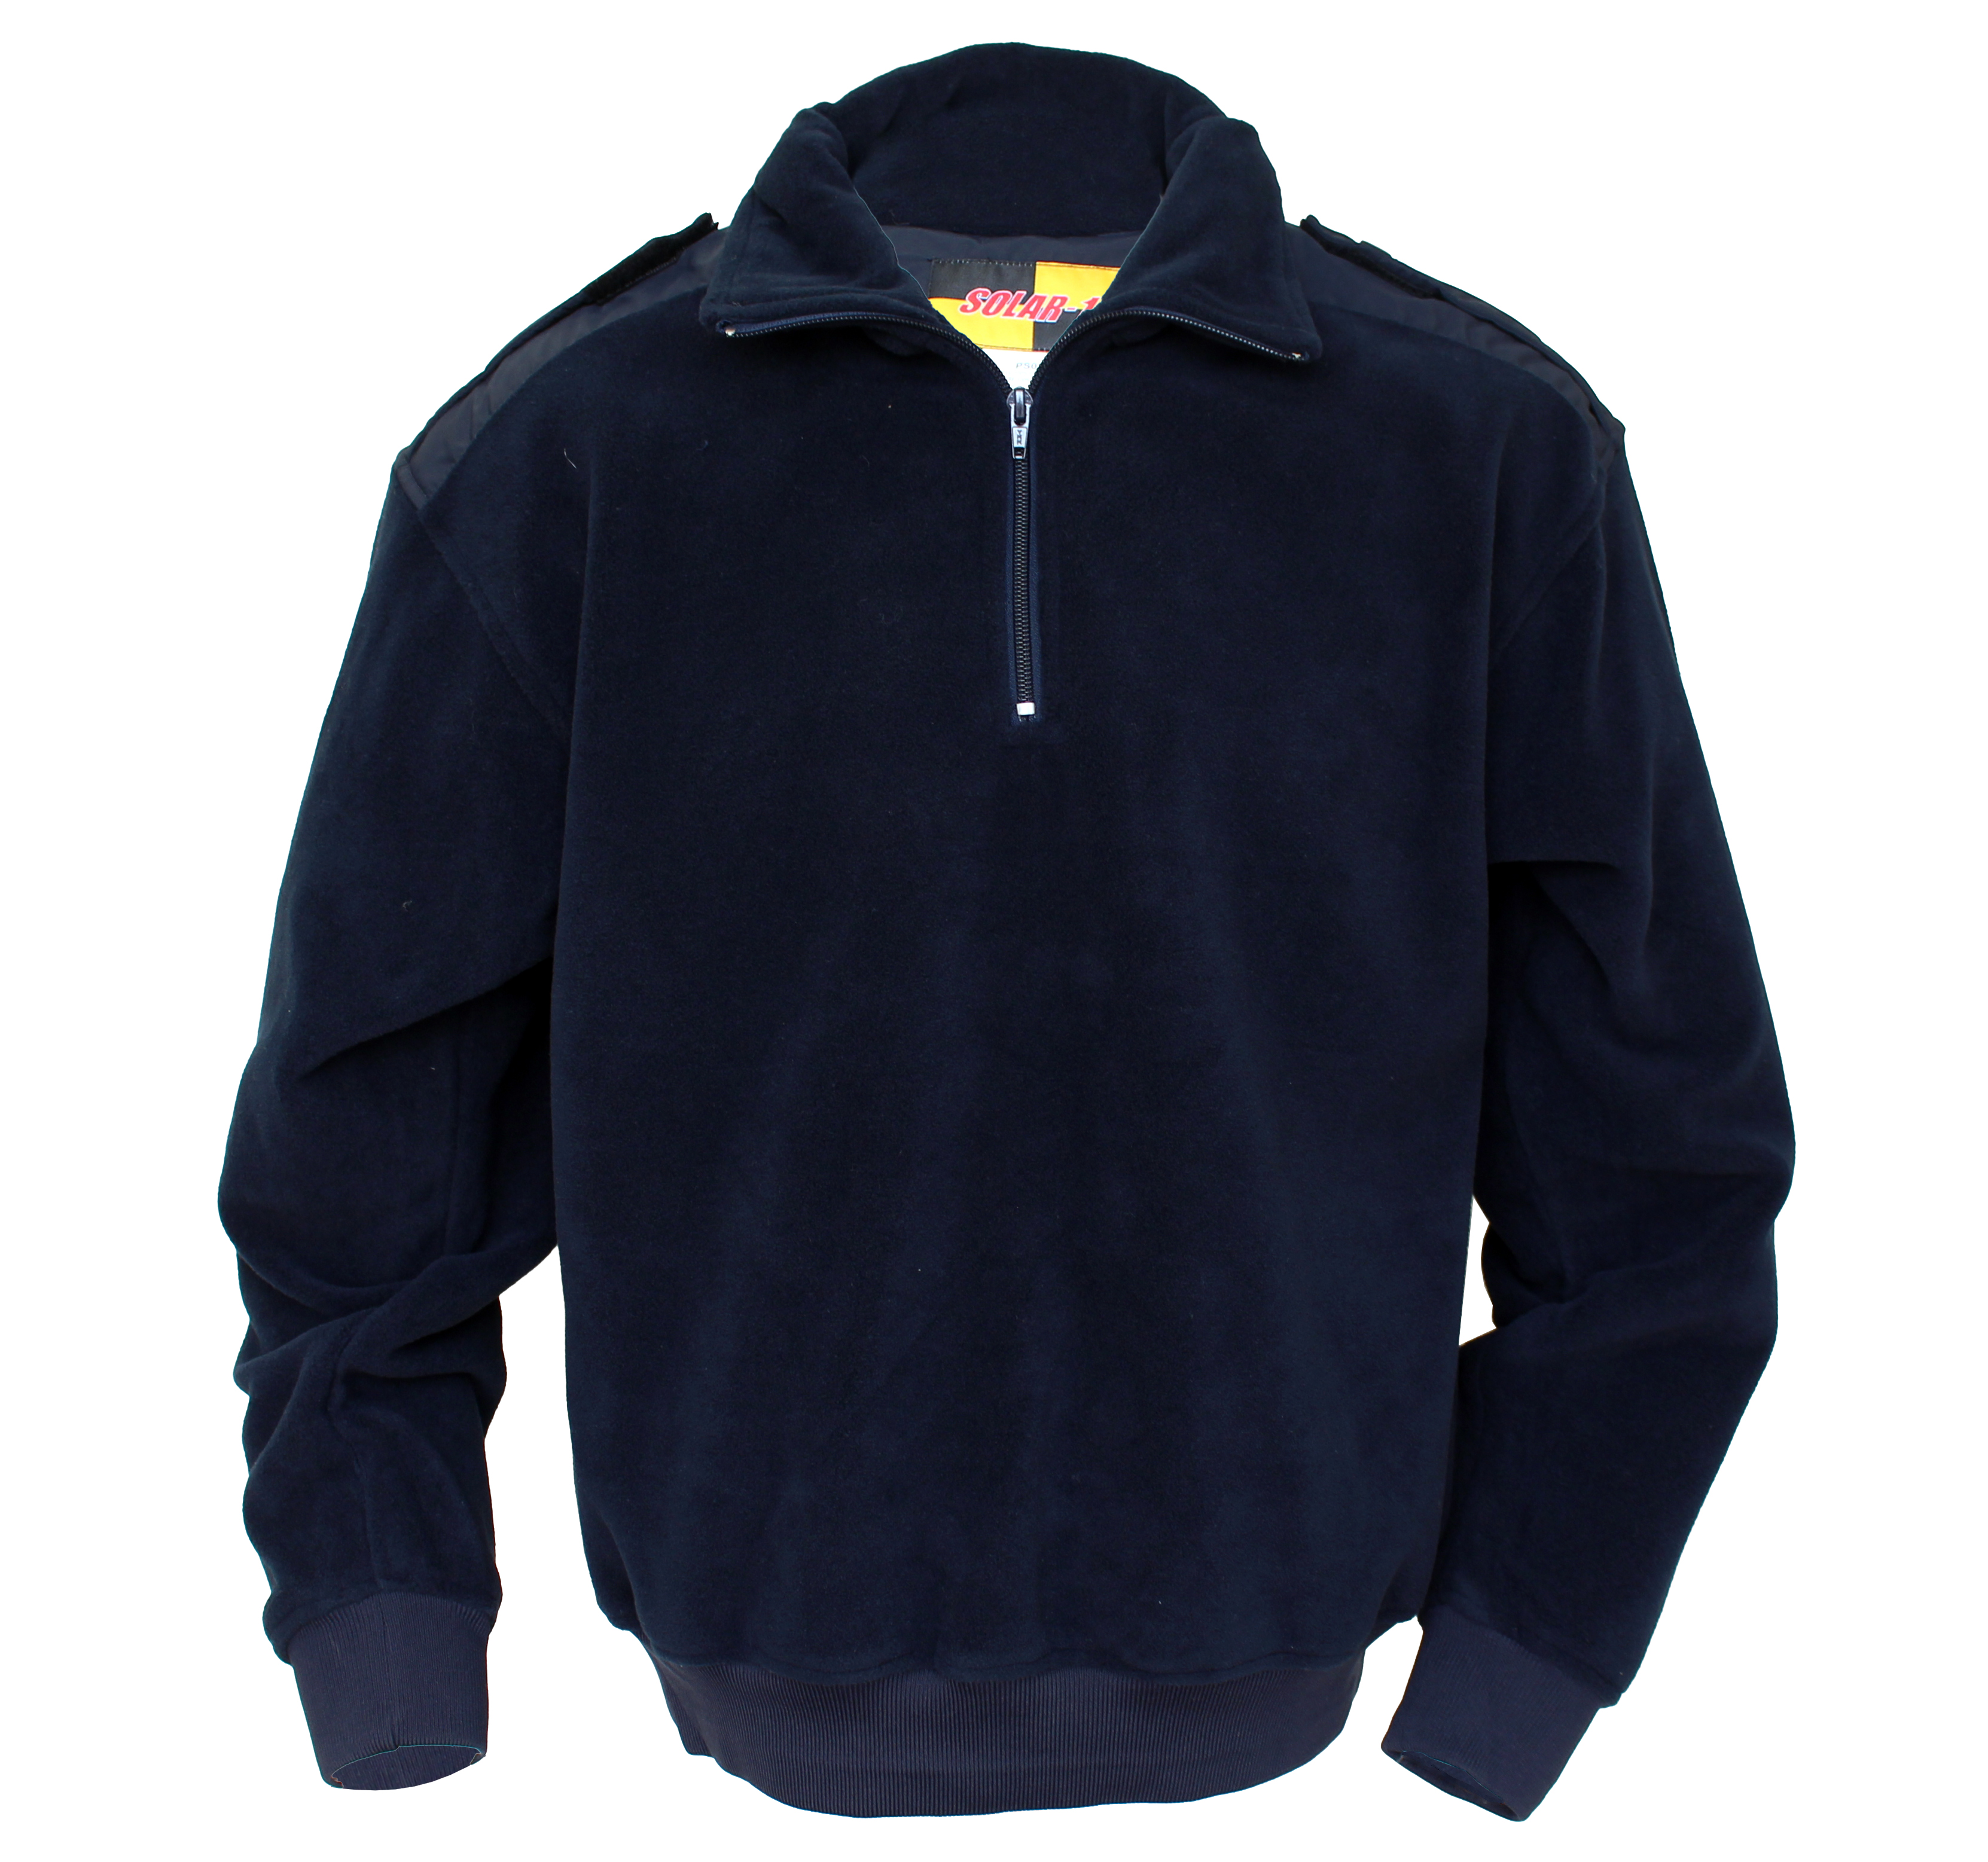 Solar-1-Clothing-Fleece-Pullover-PS01